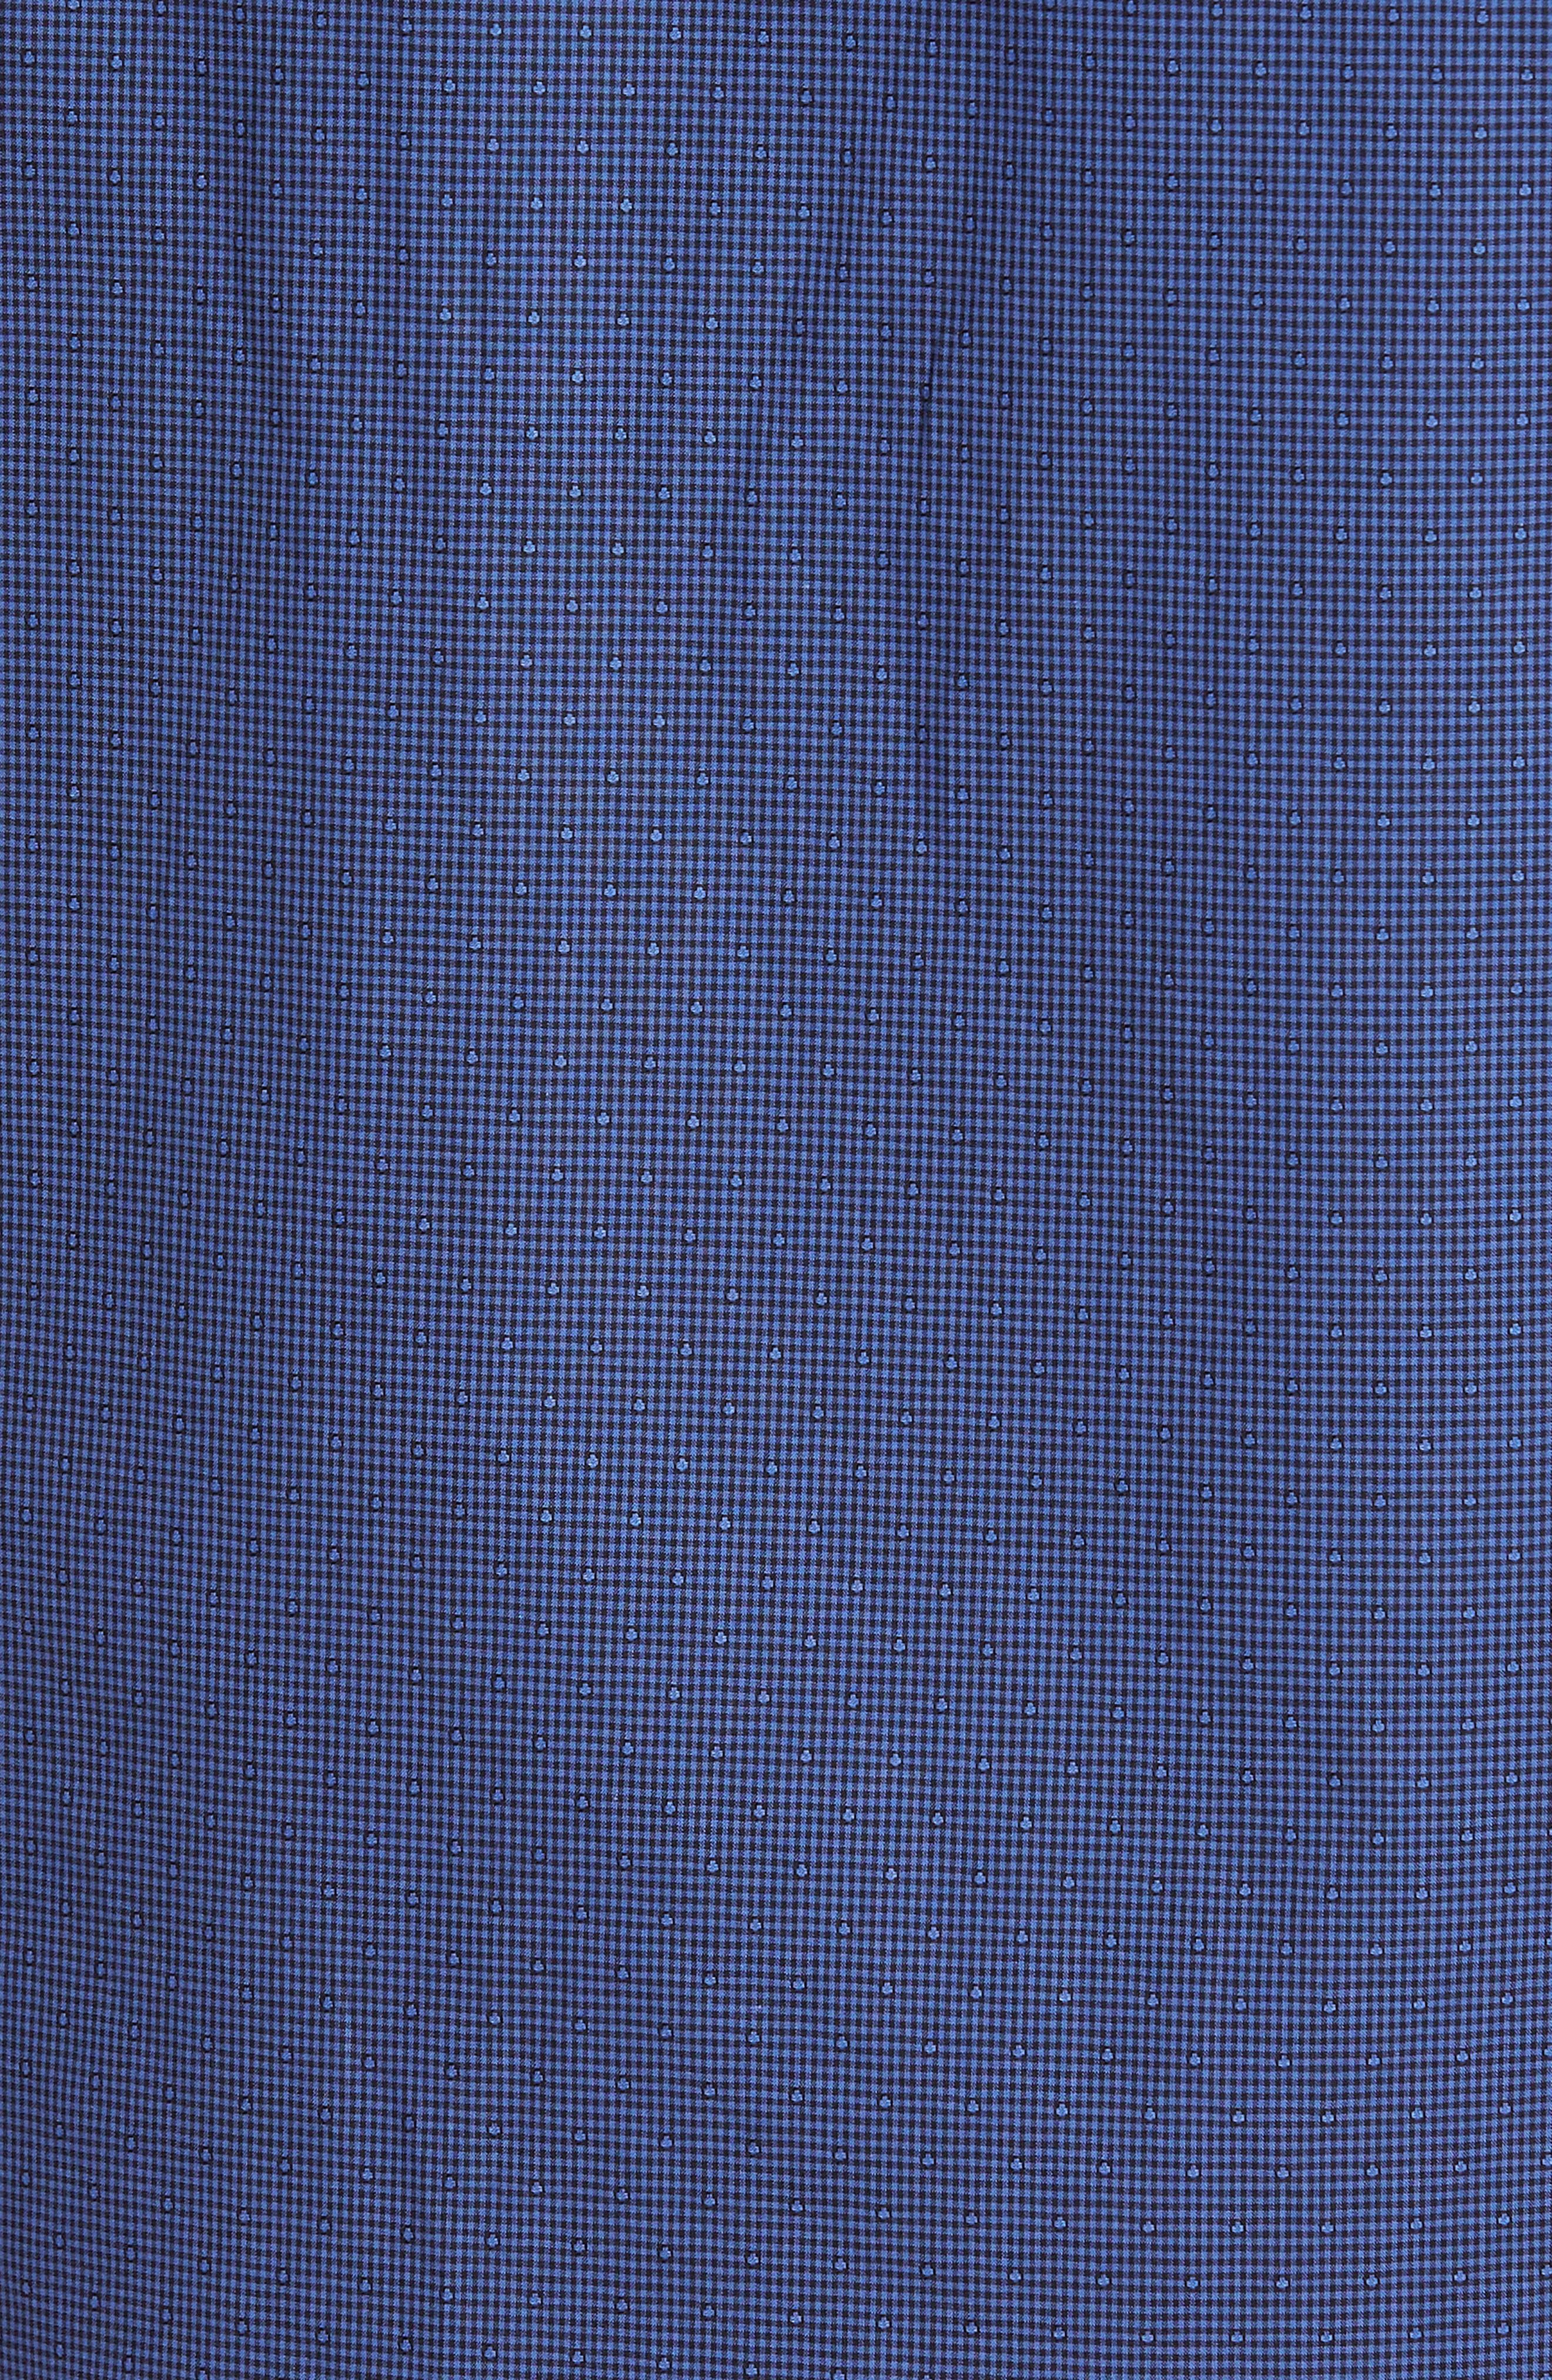 Galileo Dobby Microcheck Sport Shirt,                             Alternate thumbnail 5, color,                             410